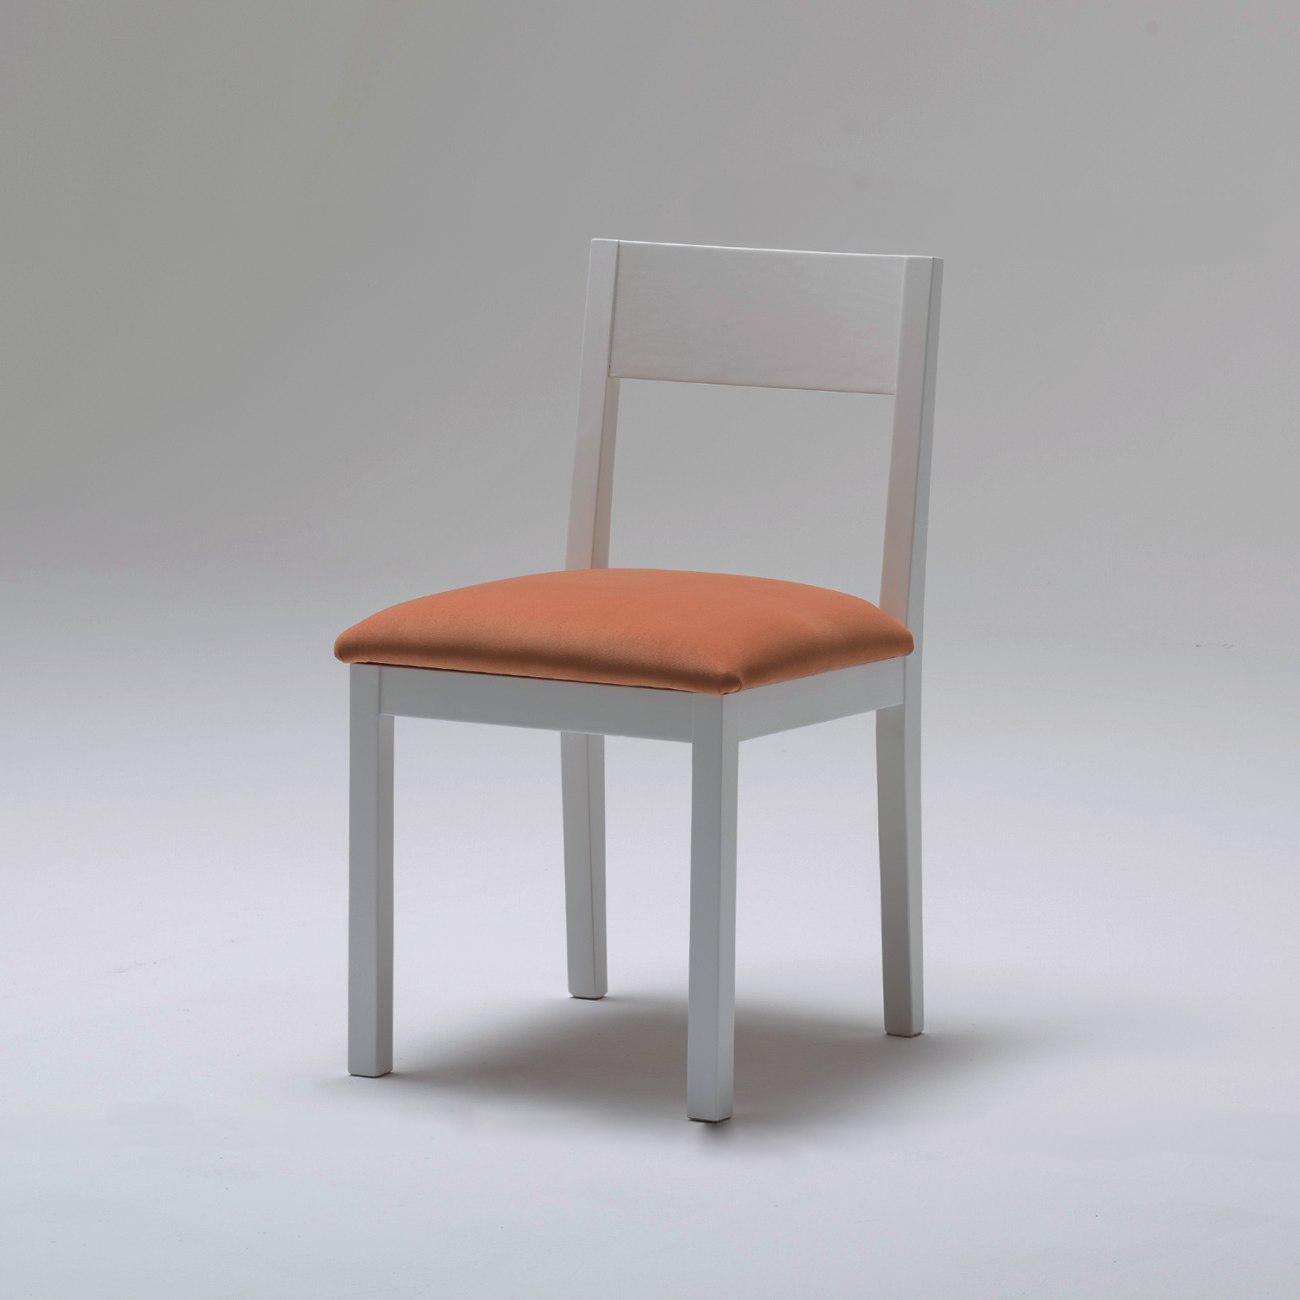 sandalye_dunyasi_mobilyacini_sn_mobilya_fold_beyaz_sandalye (1)